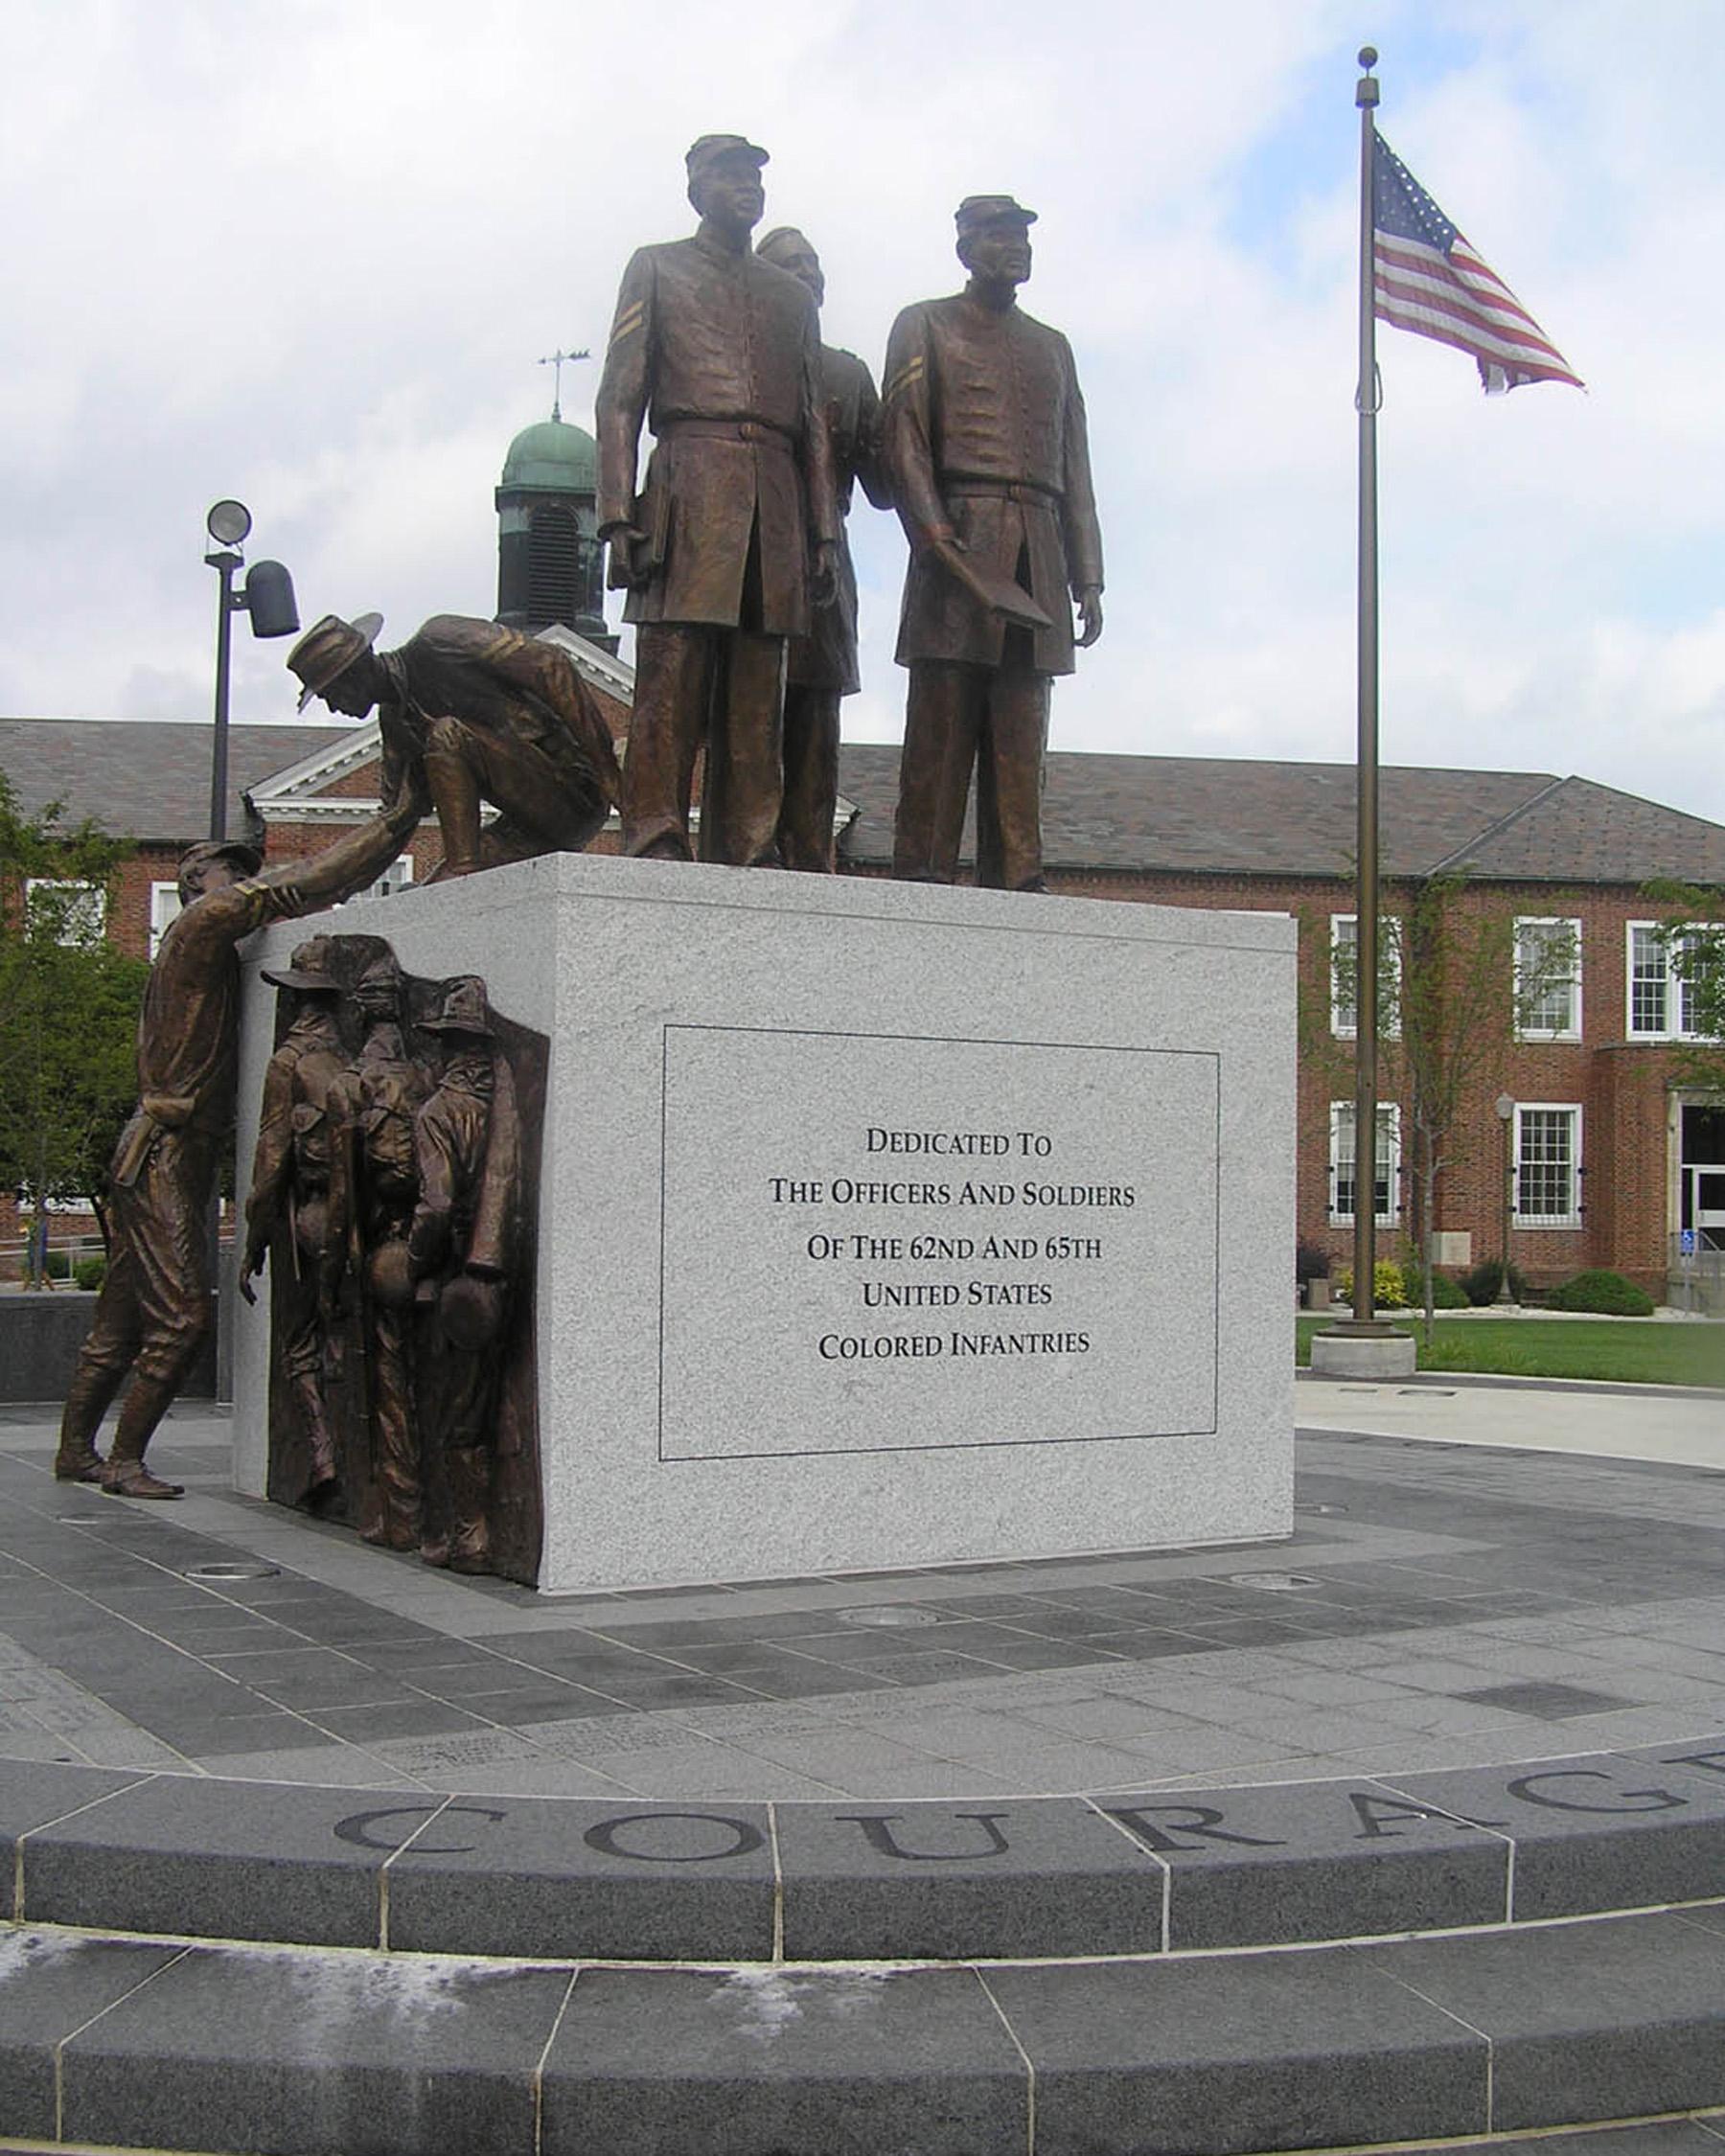 1st Missouri Regiment of Colored Infantry